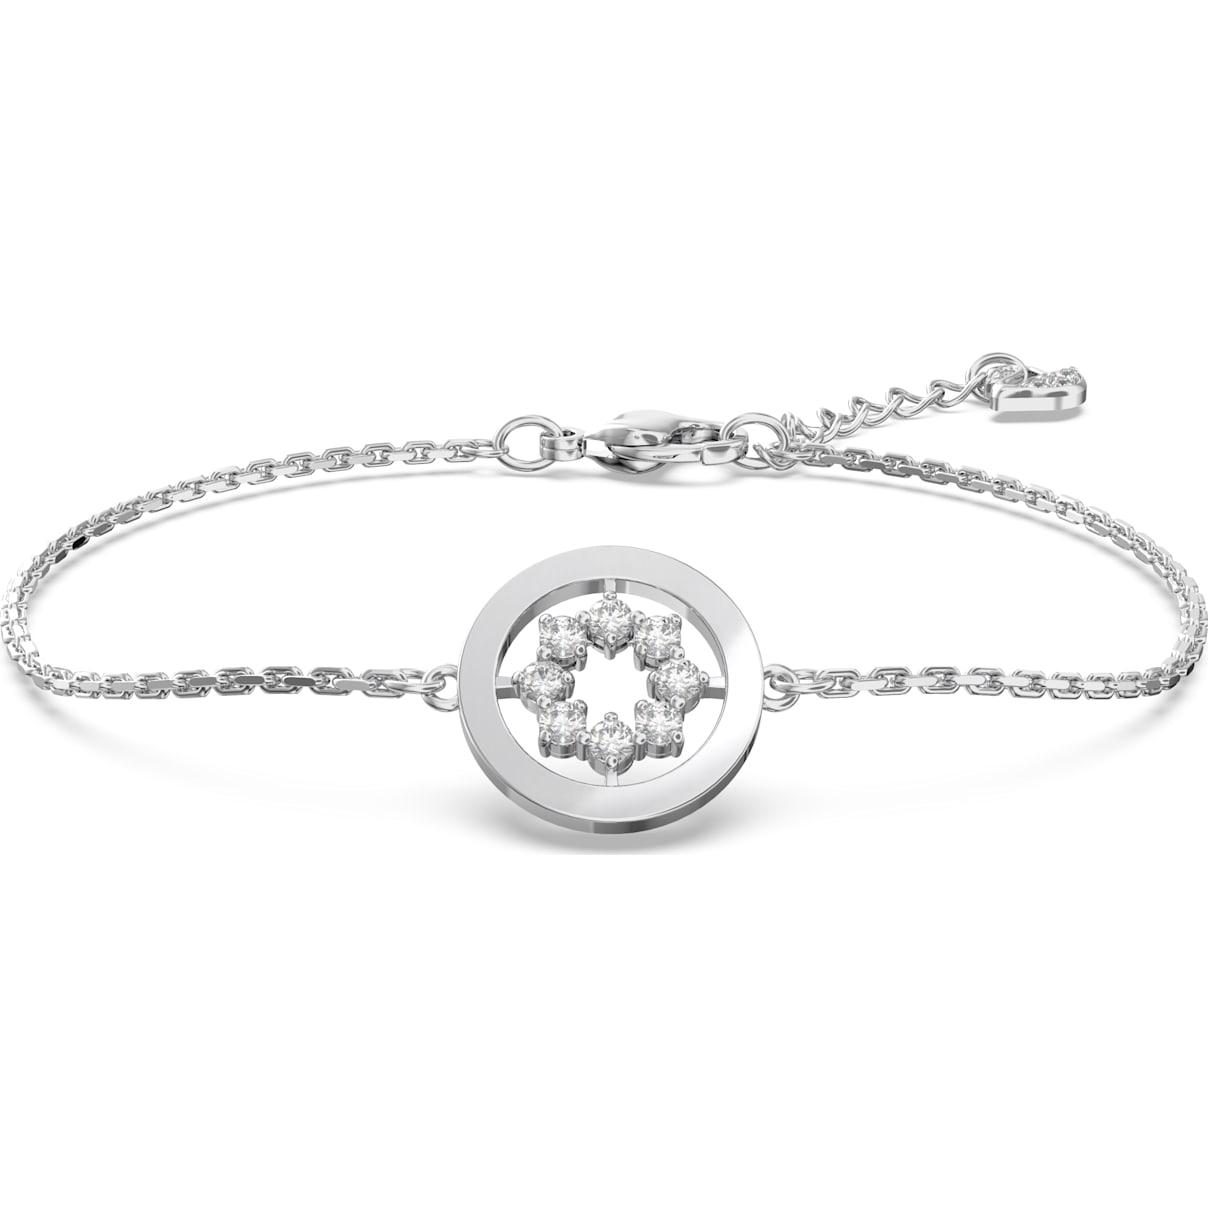 Swarovski Further Circle Bracelet, White, Rhodium plated